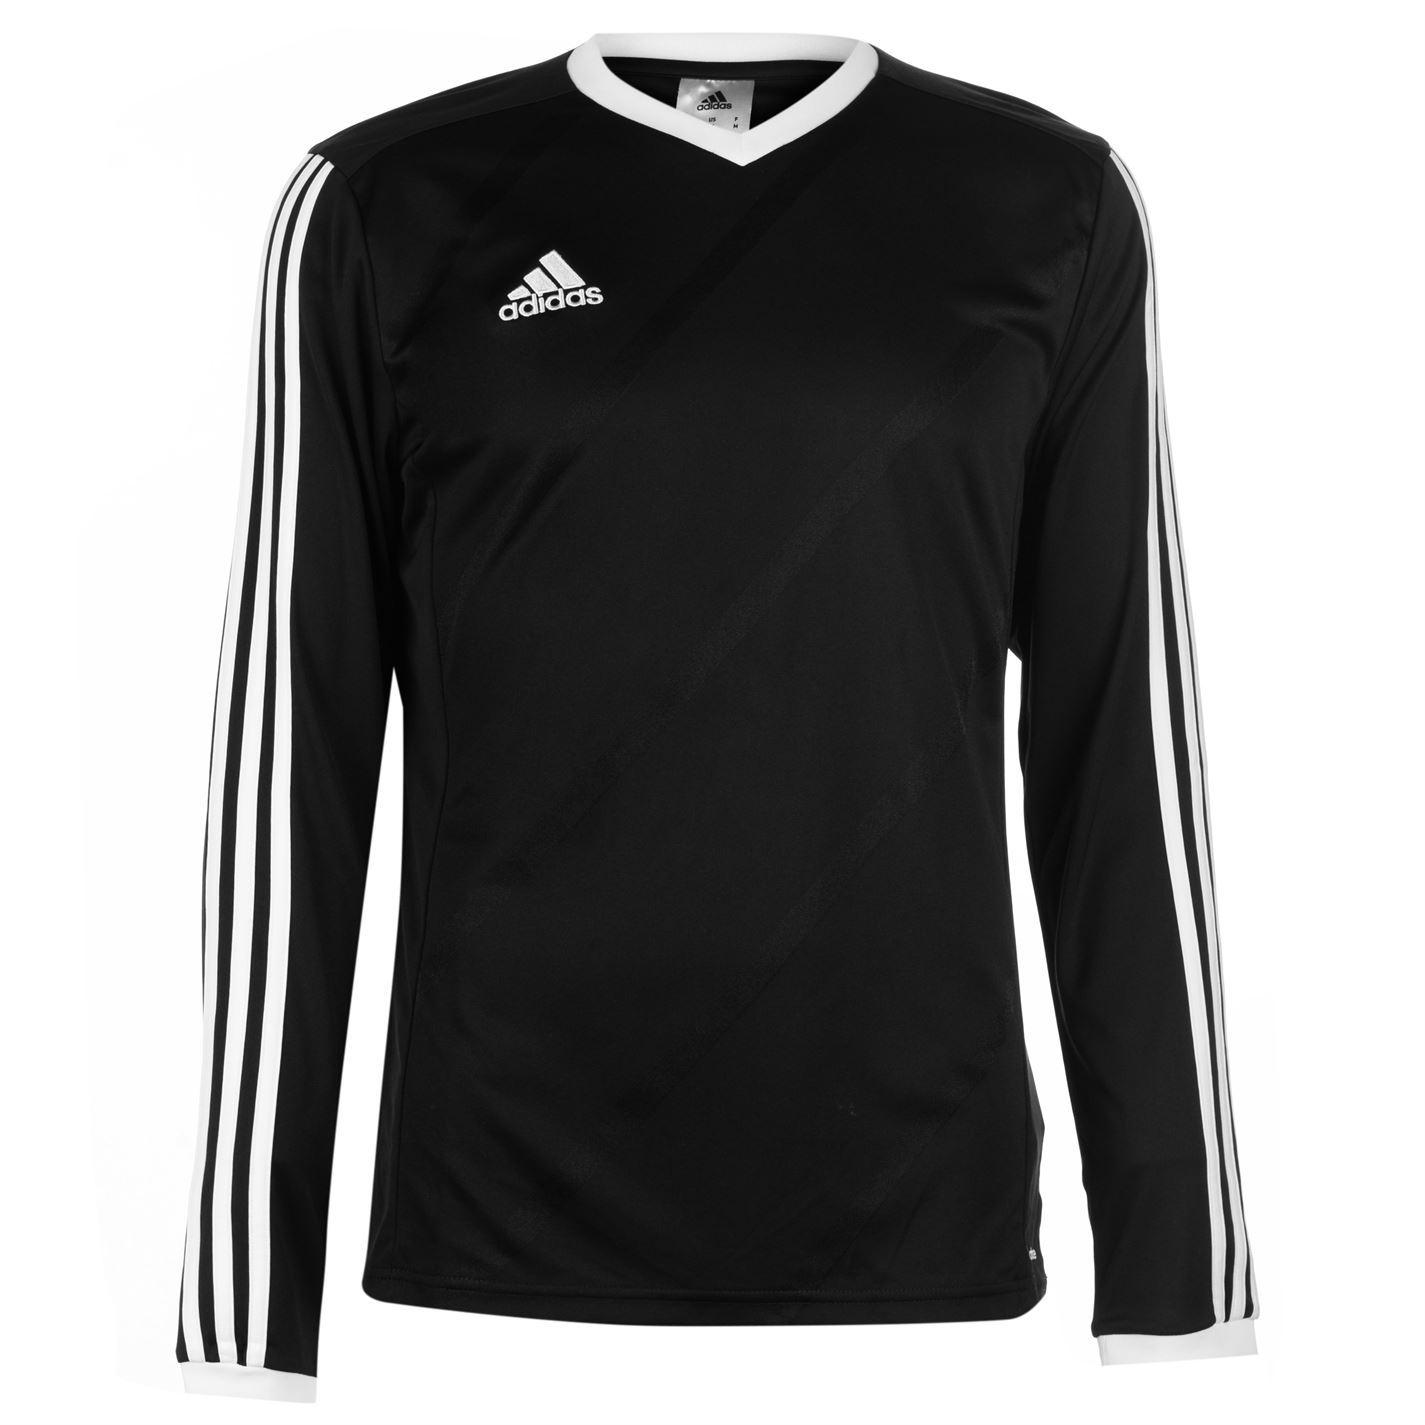 adidas long sleeve jersey tee f24de6